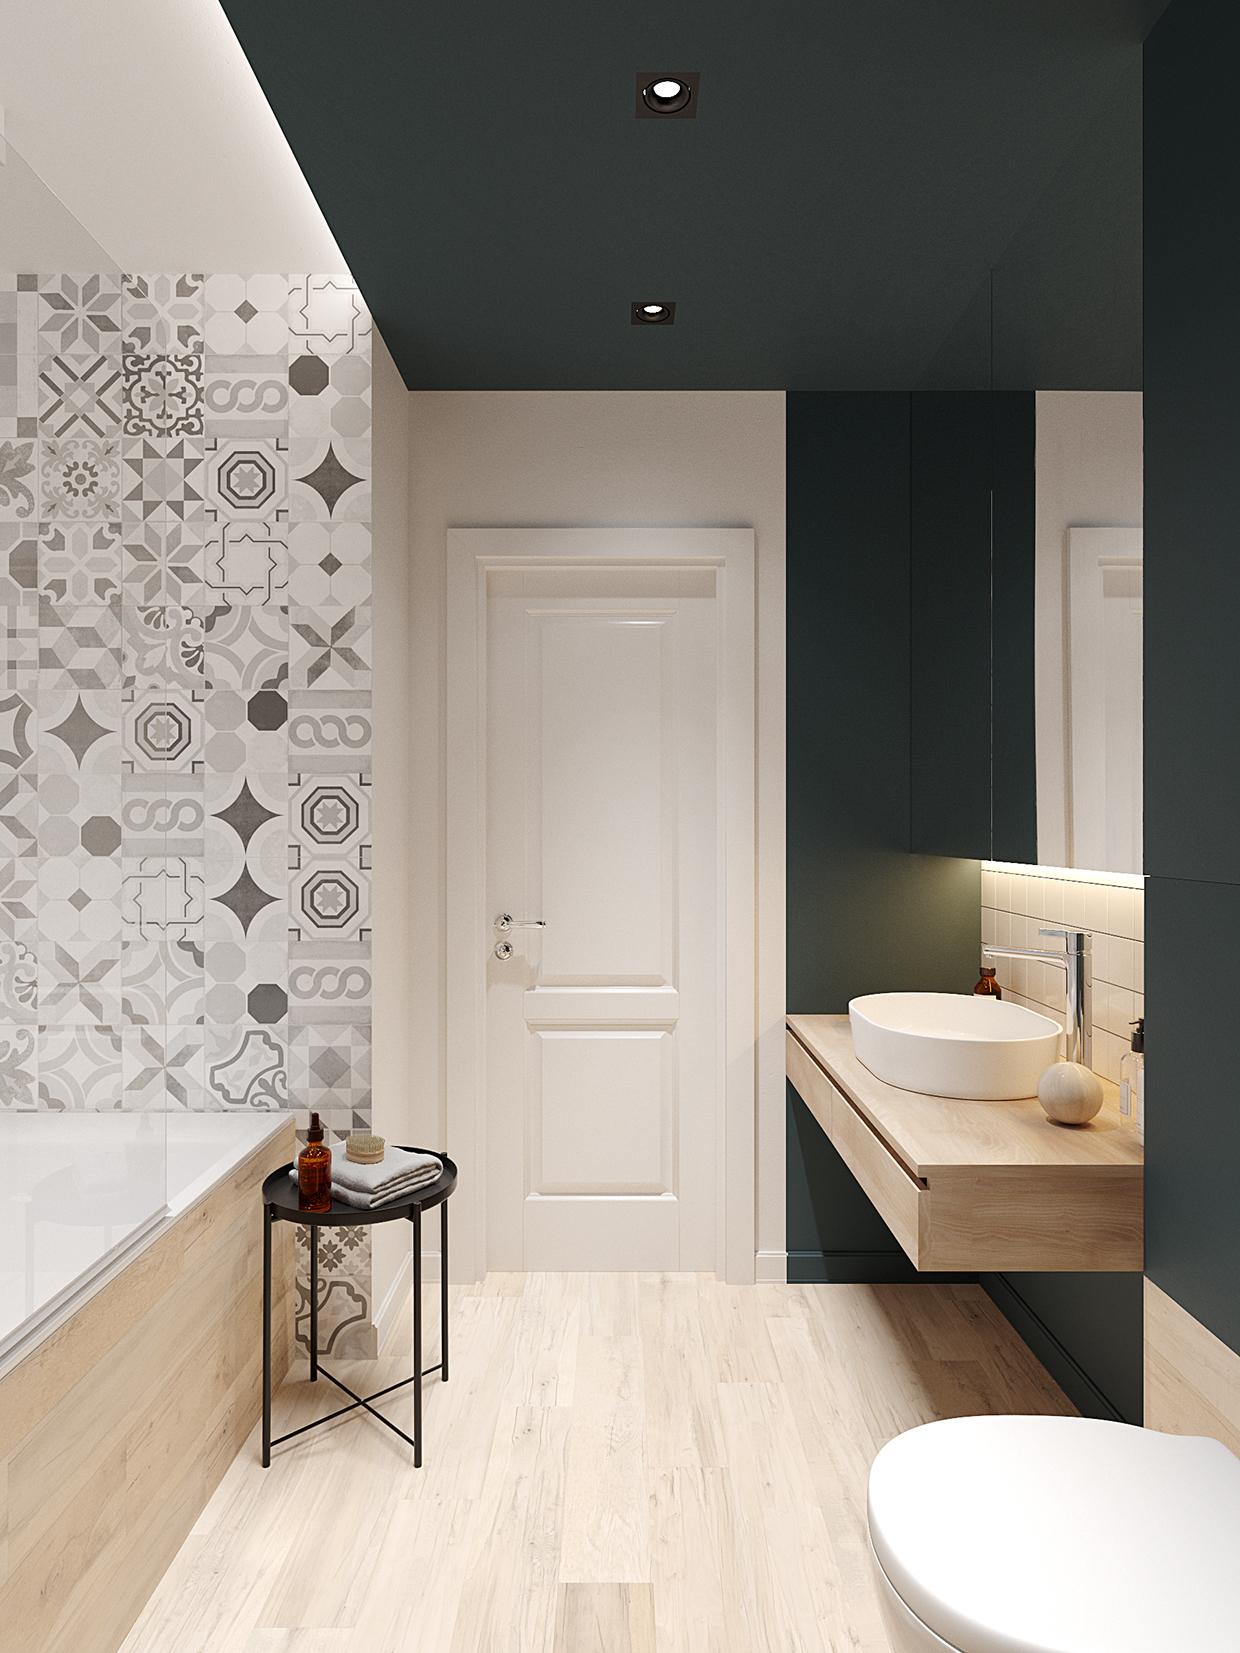 Decorative Tiles Bathroom Brilliant Remodeling Ideas For Exposed Brick Tiles In A Bathroom  Bricks Inspiration Design